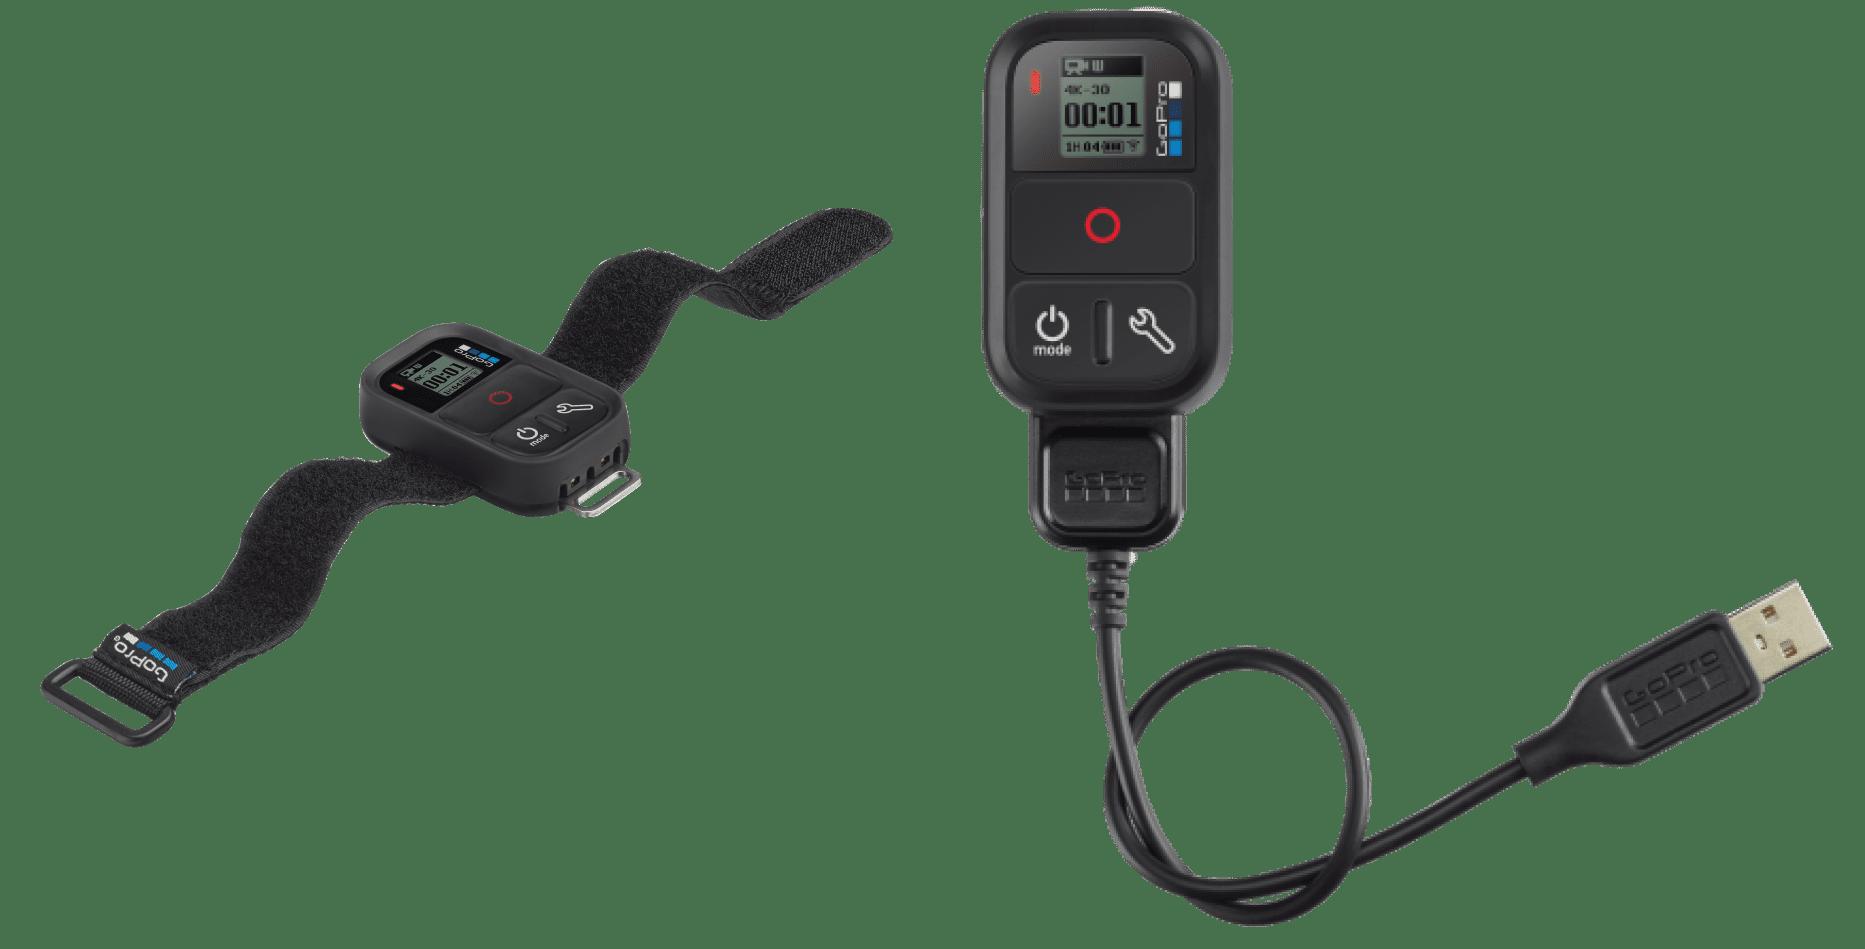 Smart-remote-image